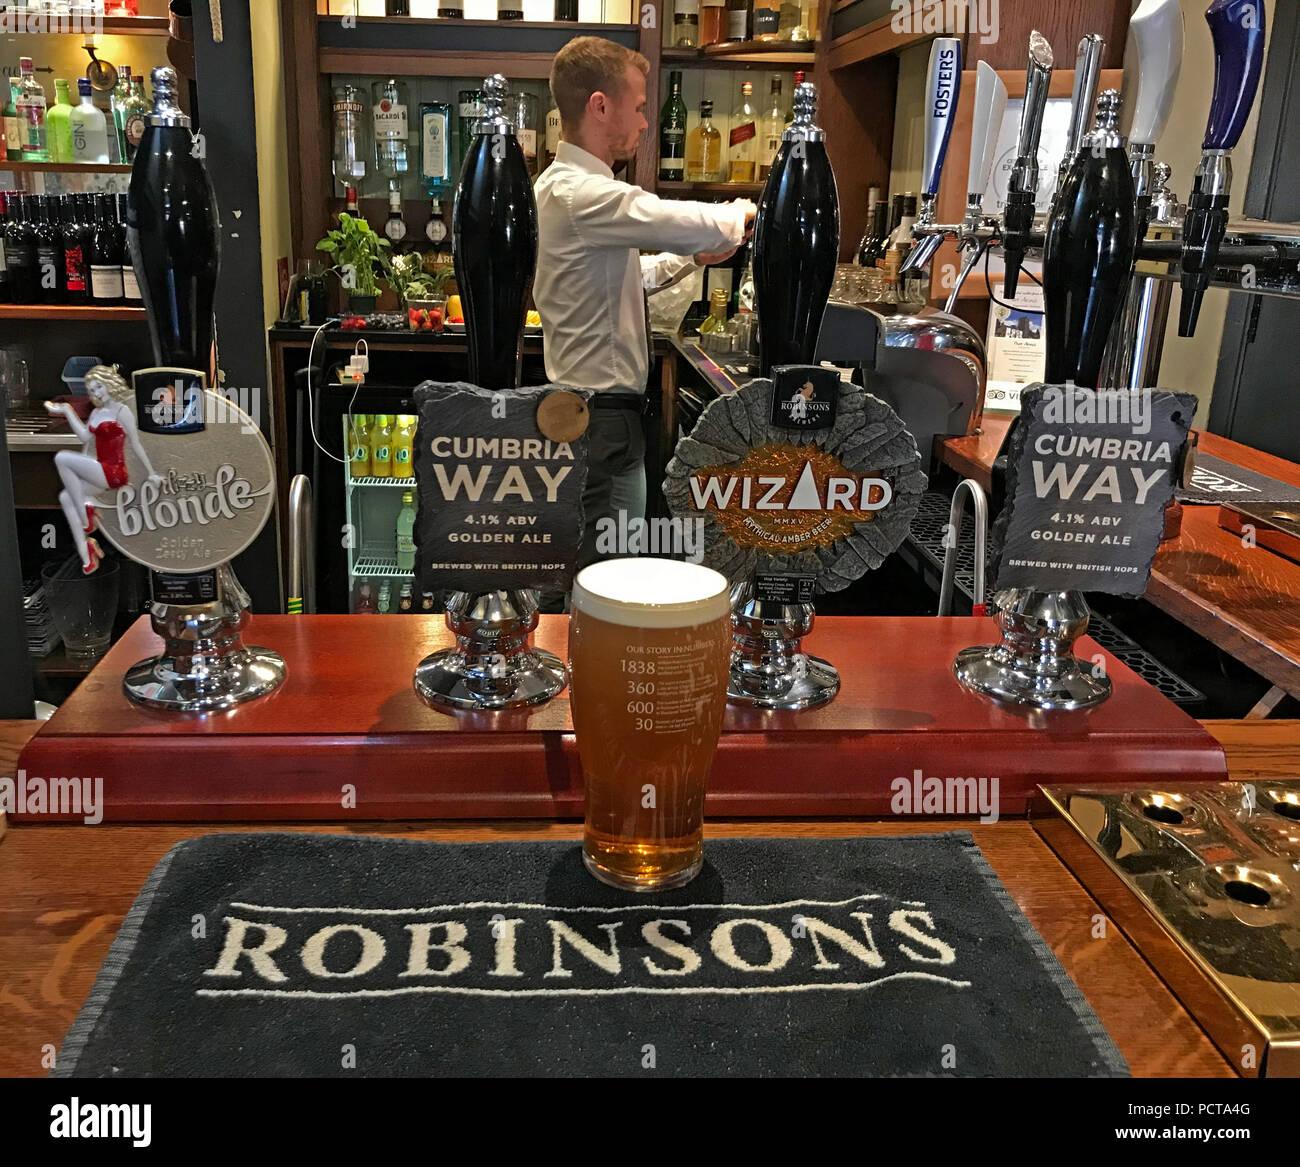 GoTonySmith,@HotpixUK,ale,beer,beers,brewery,brewers,pump,pumps,hand